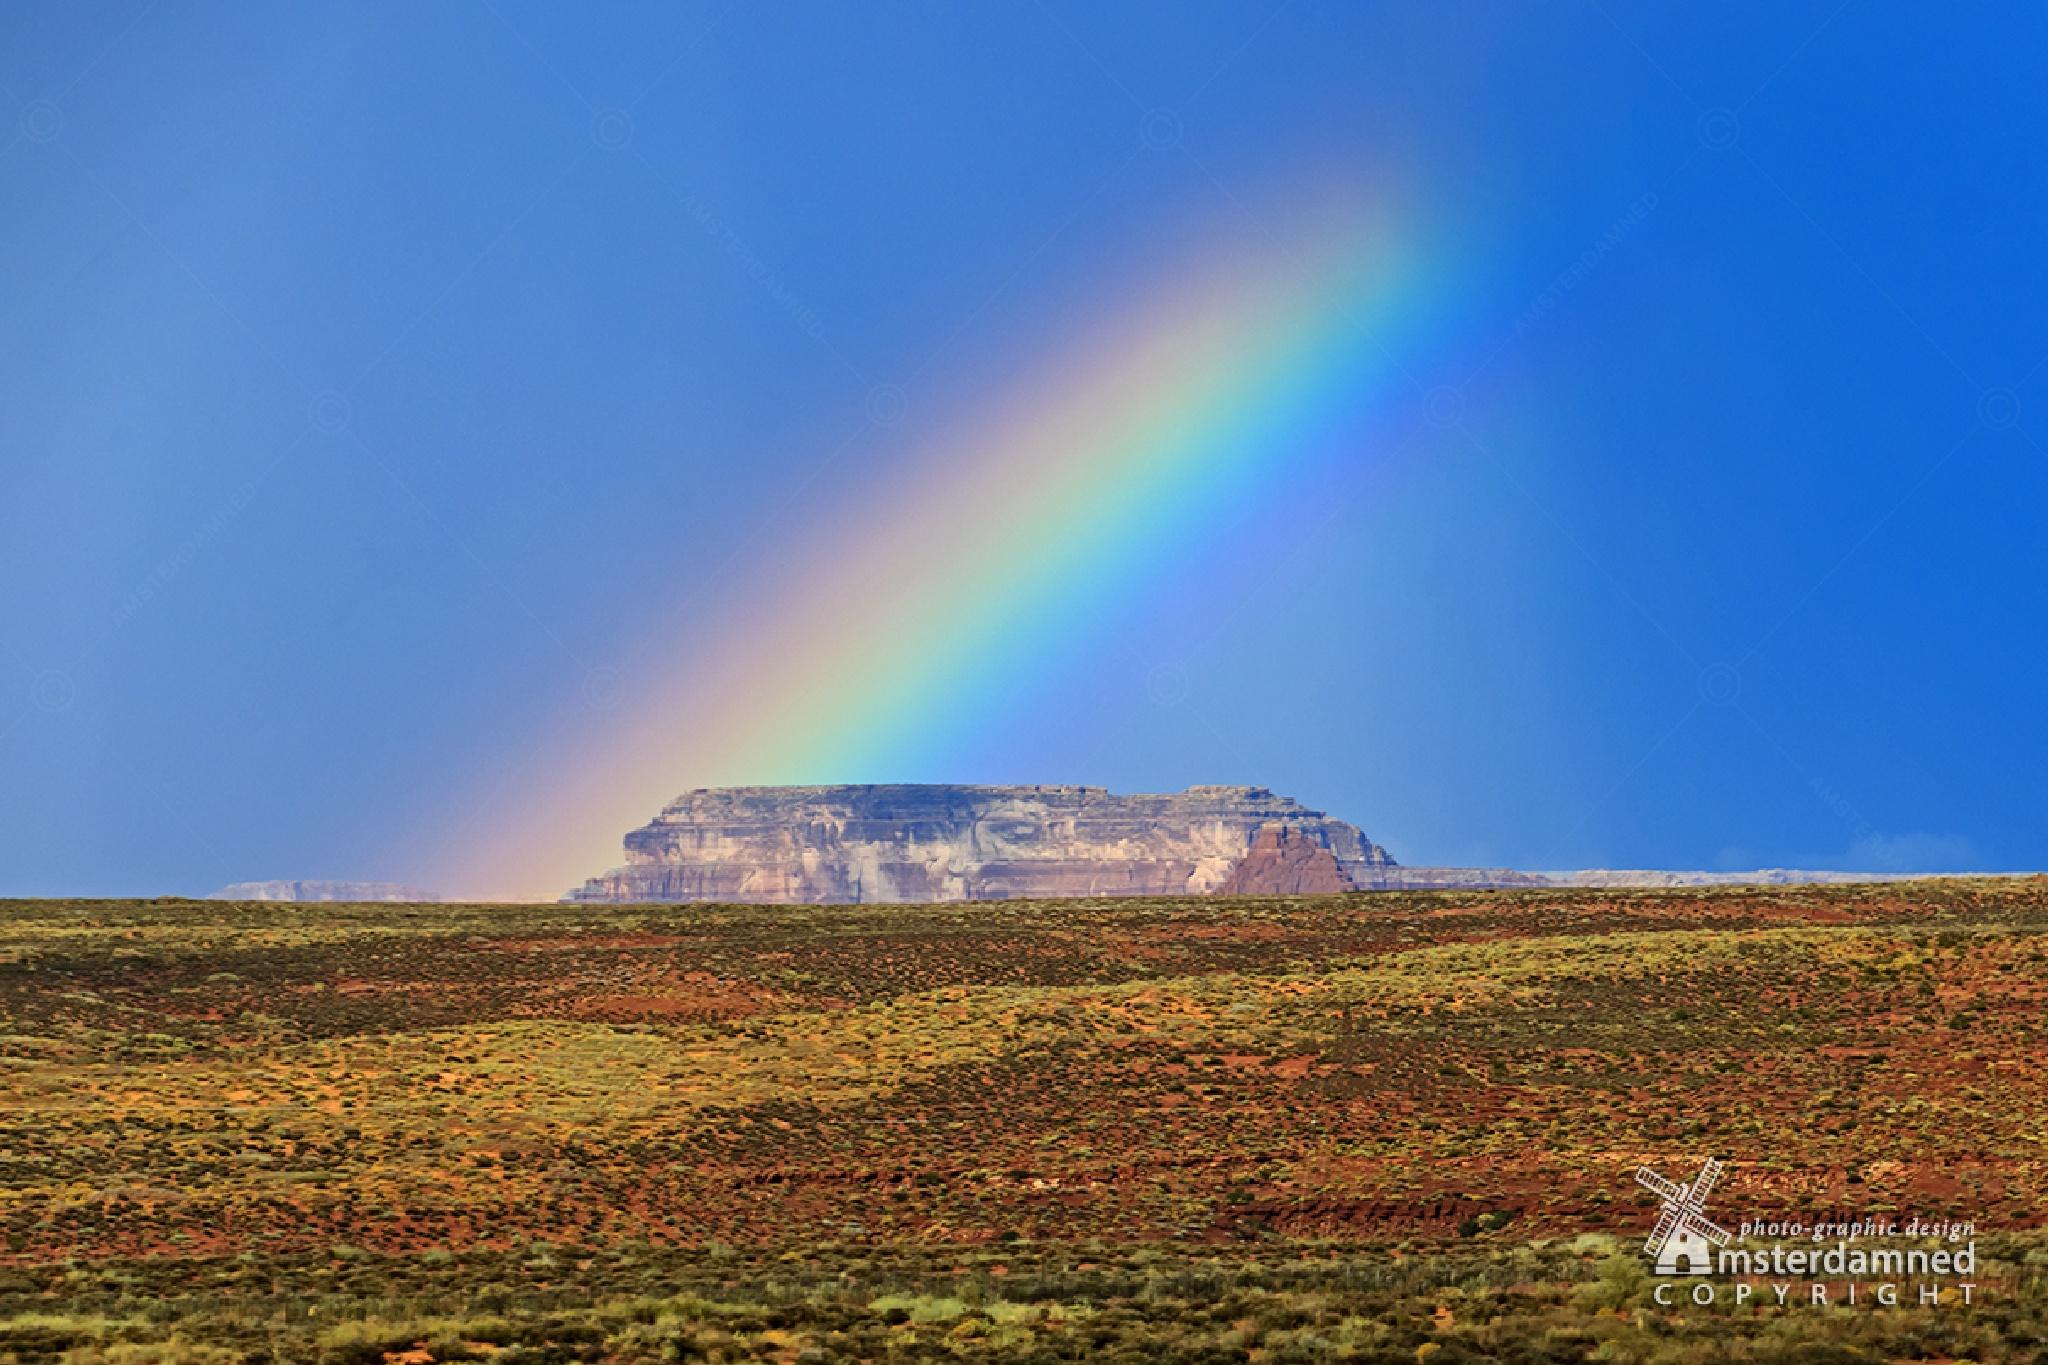 Arizona, United States by Michael